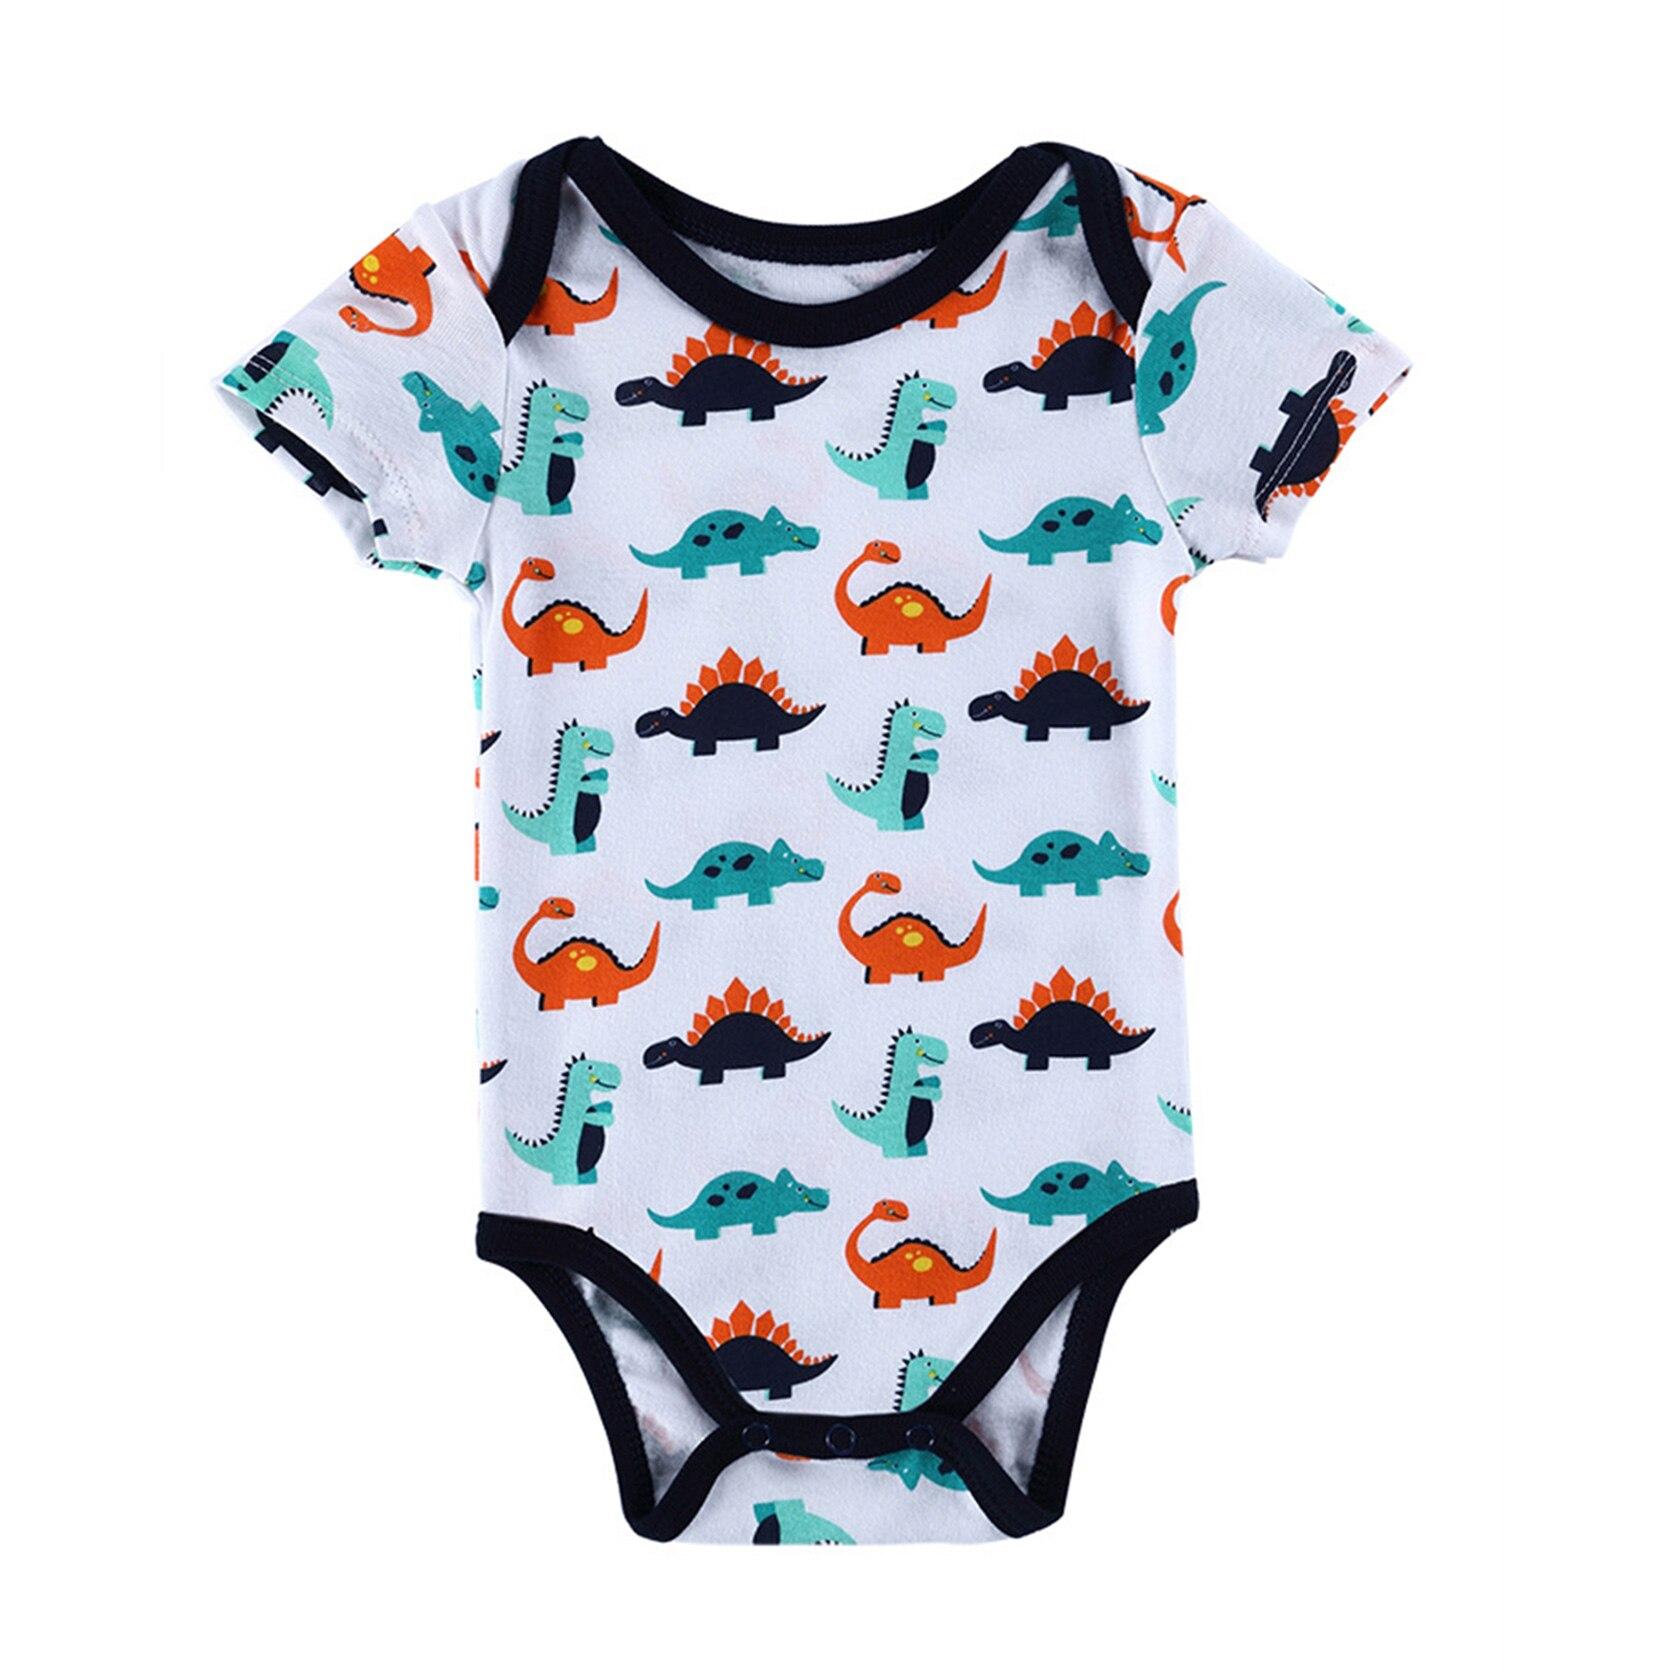 Baby Romper Short Sleeve Cotton Jumpsuit Newborn Baby Boy Girl Clothes Cartoon Bodysuit Summer Infant Clothing